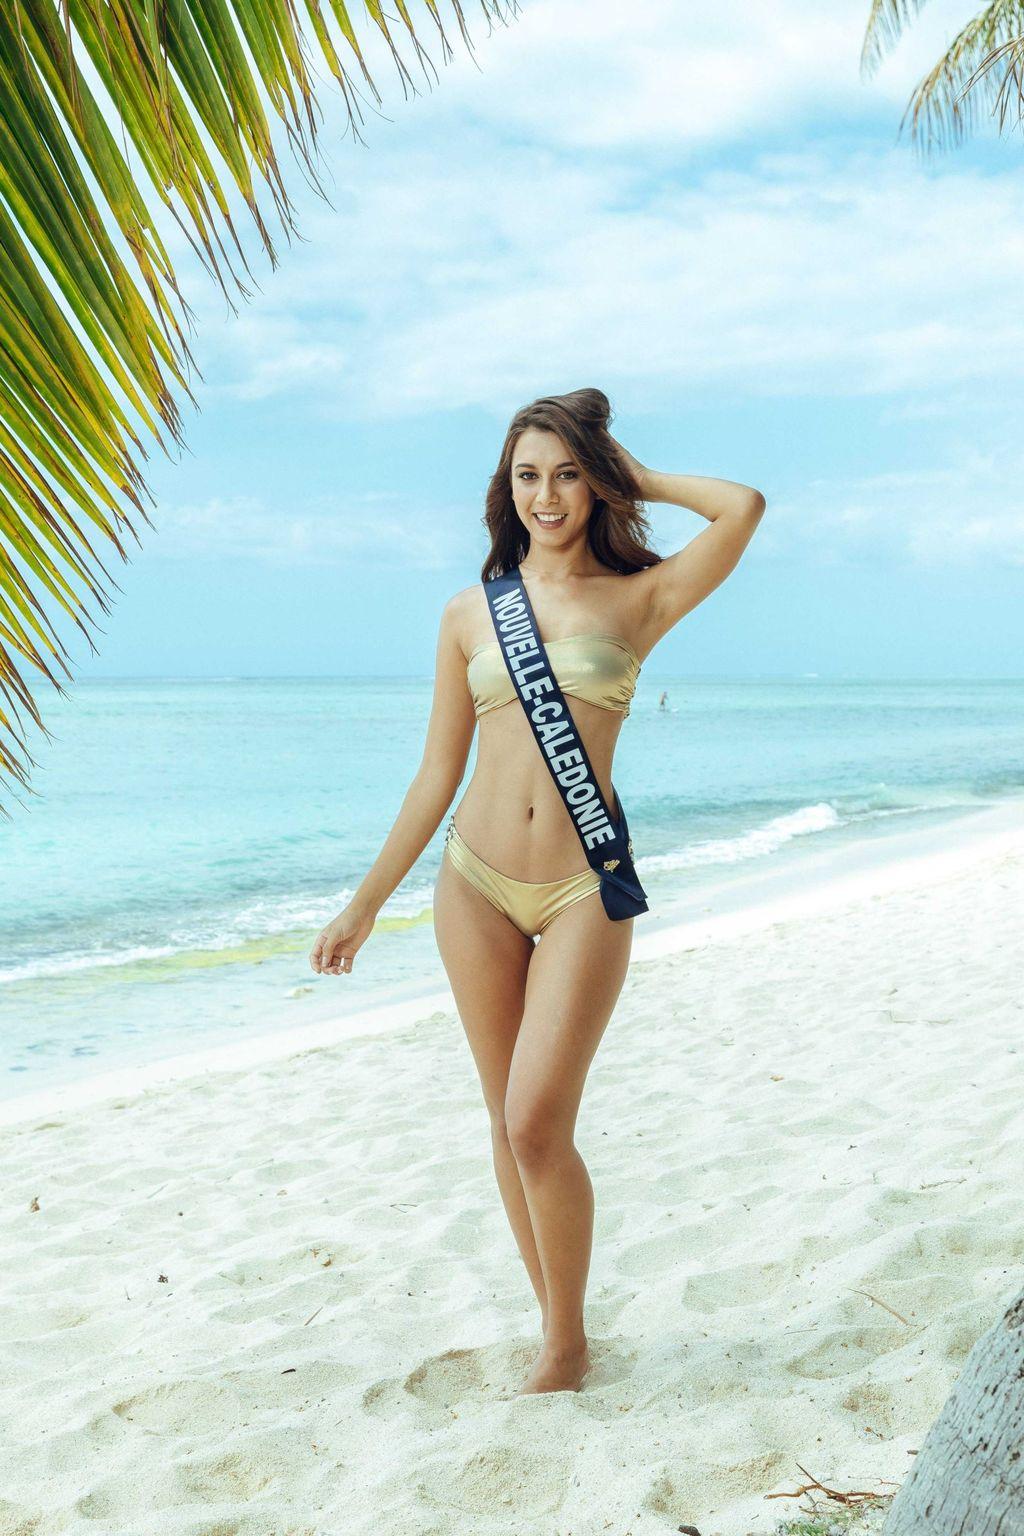 Miss Nouvelle Caledonie, Amandine Chabrier